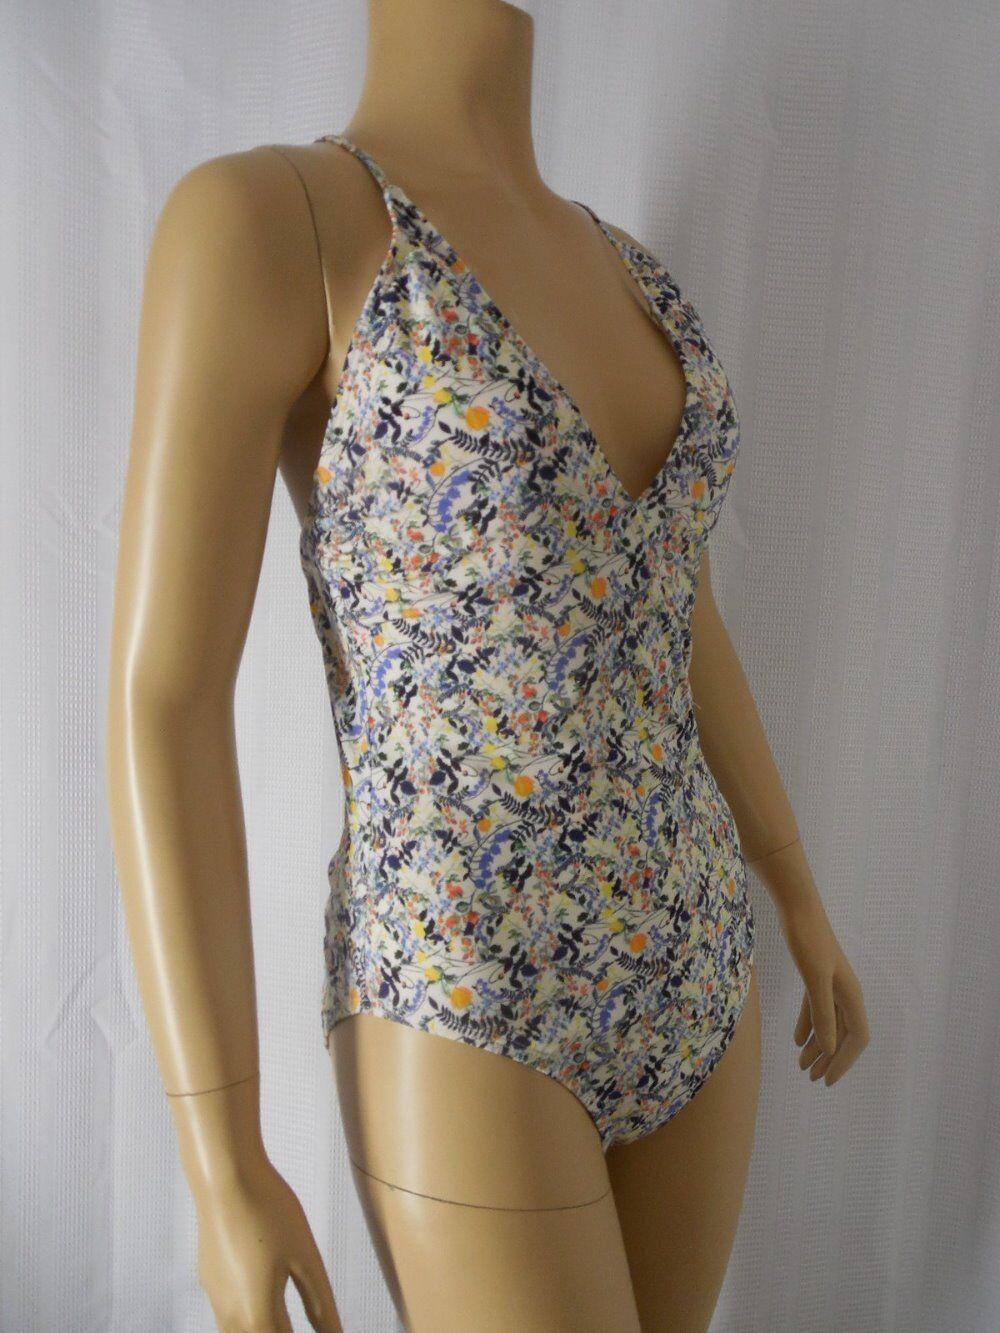 ANTONIO MELANI Swim suit 12 white multi color floral LIBERTY fabric NWT  154